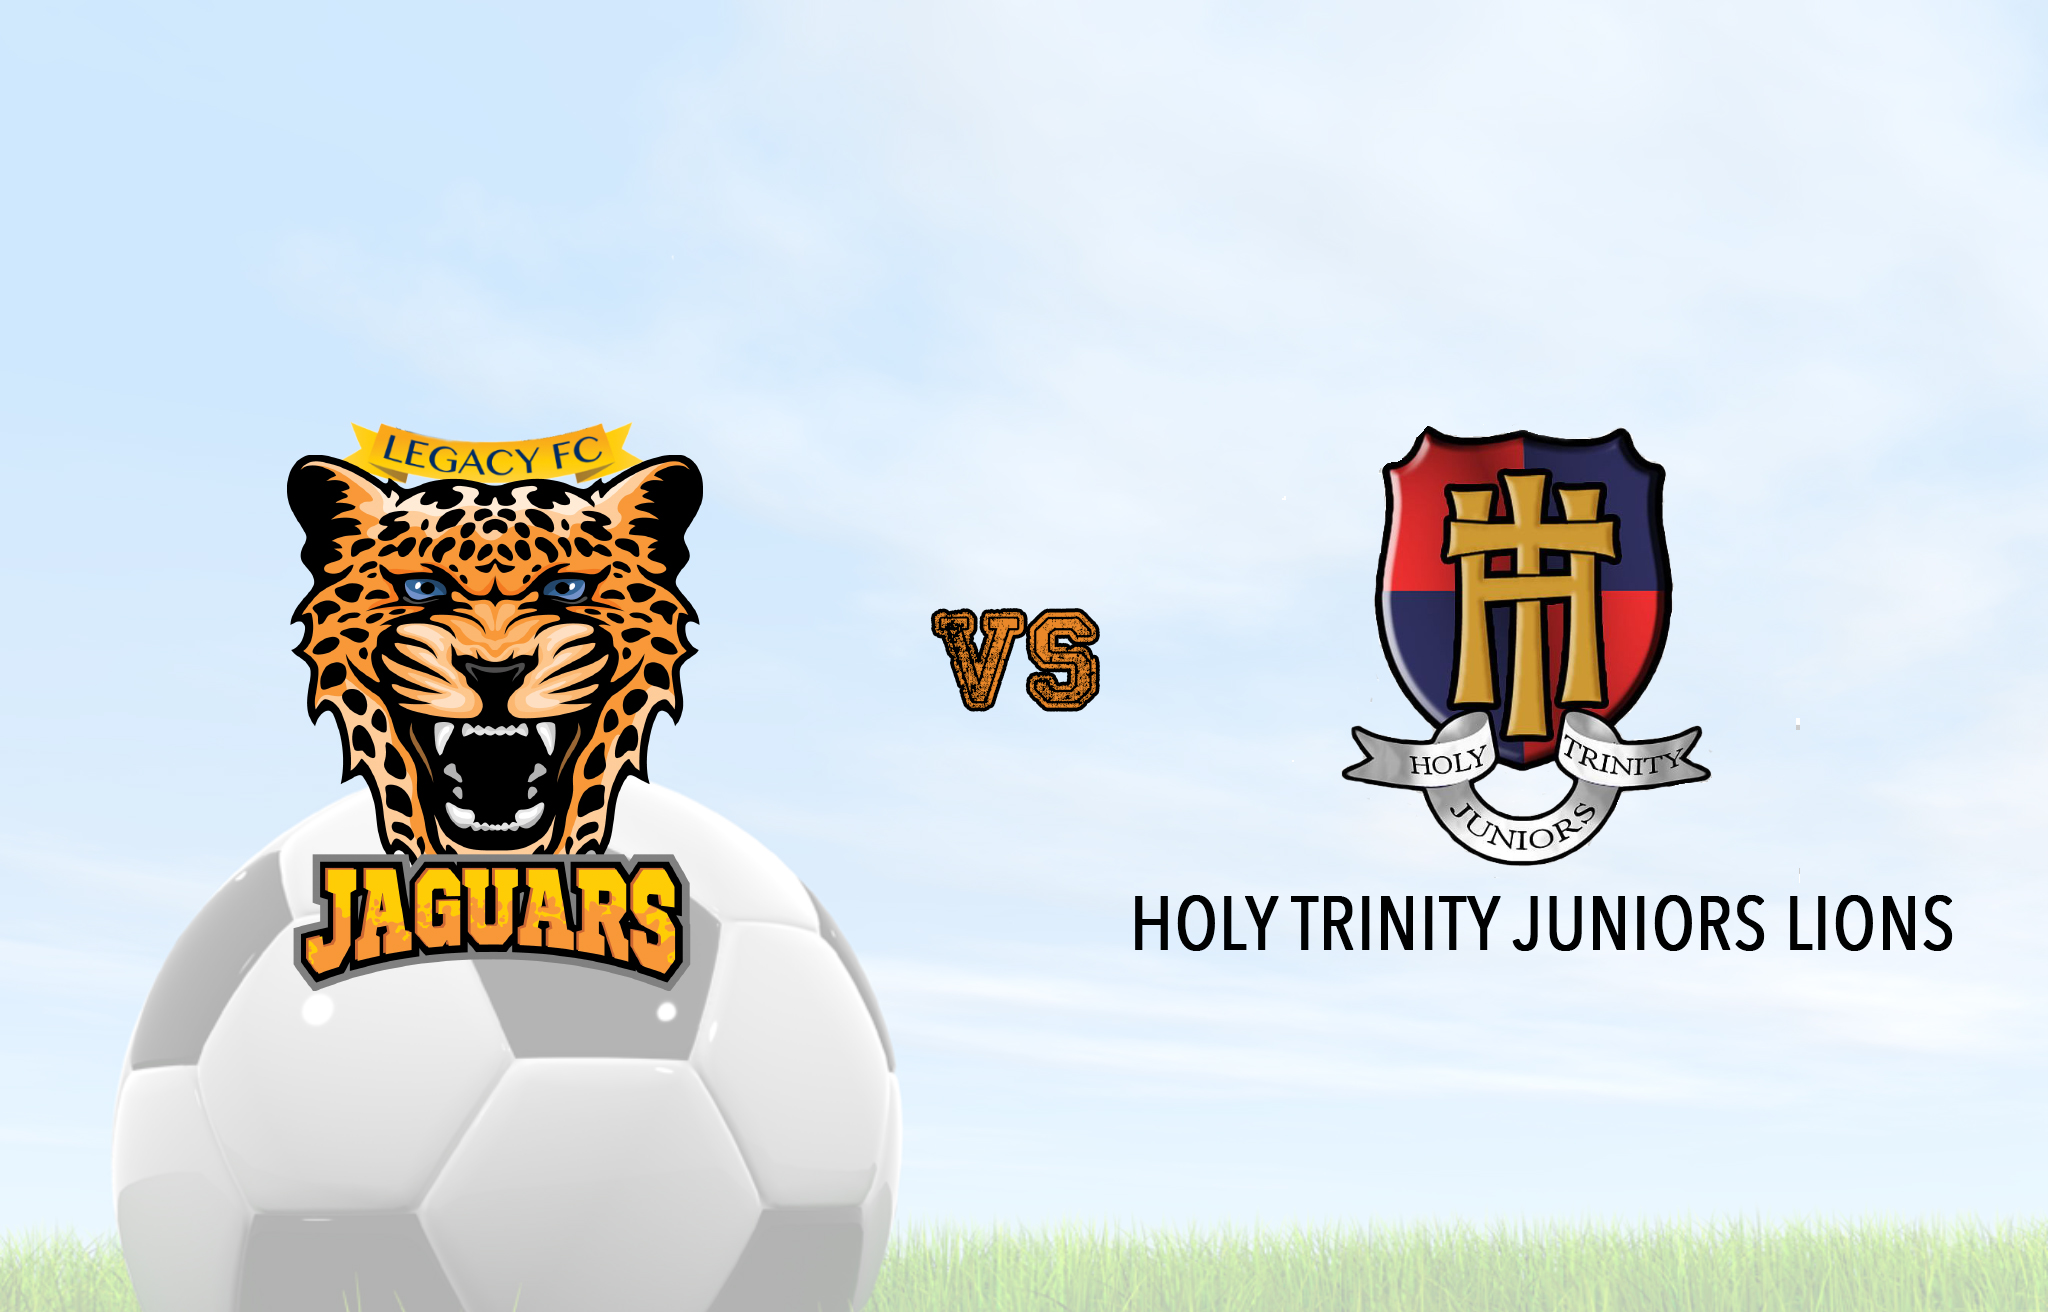 Legacy FC Jaguars vs Holy Trinity Lions